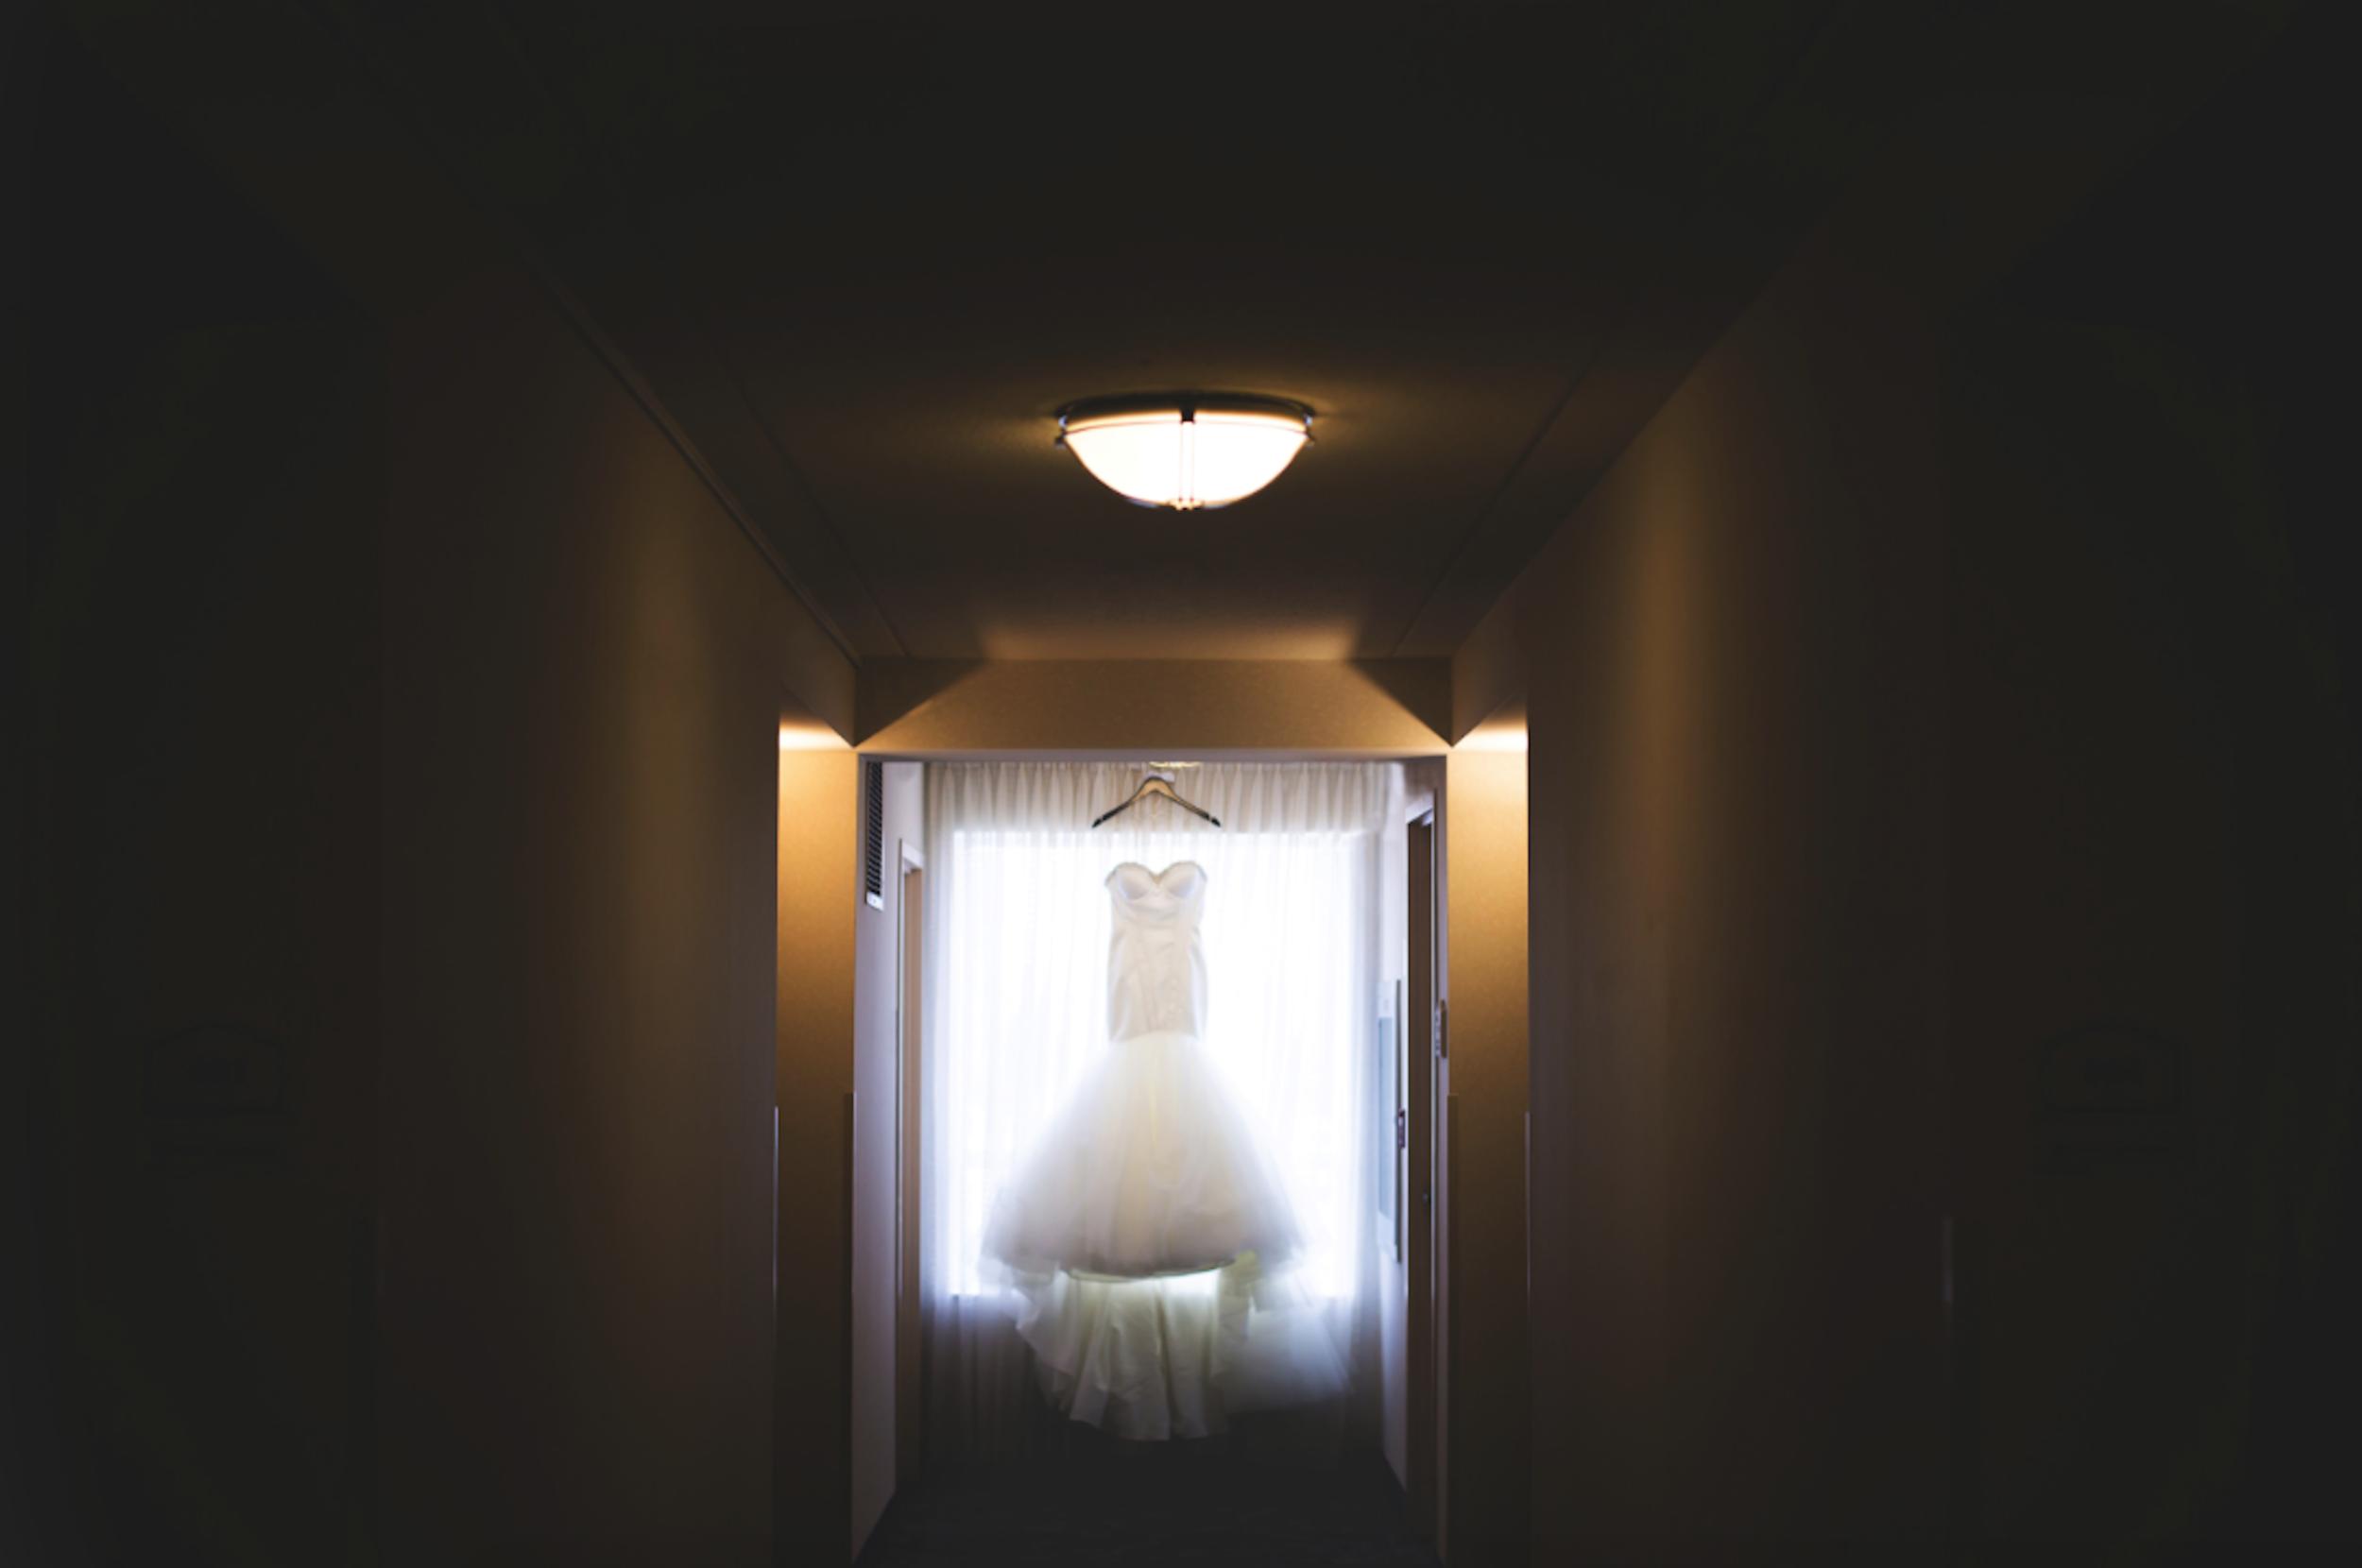 Wedding-Burlington-Convention-Center-Burlington-Oakville-Toronto-Hamilton-Niagara-Wedding-Photographer-Photography-Moments-by-Lauren-Photo-Image-2.png